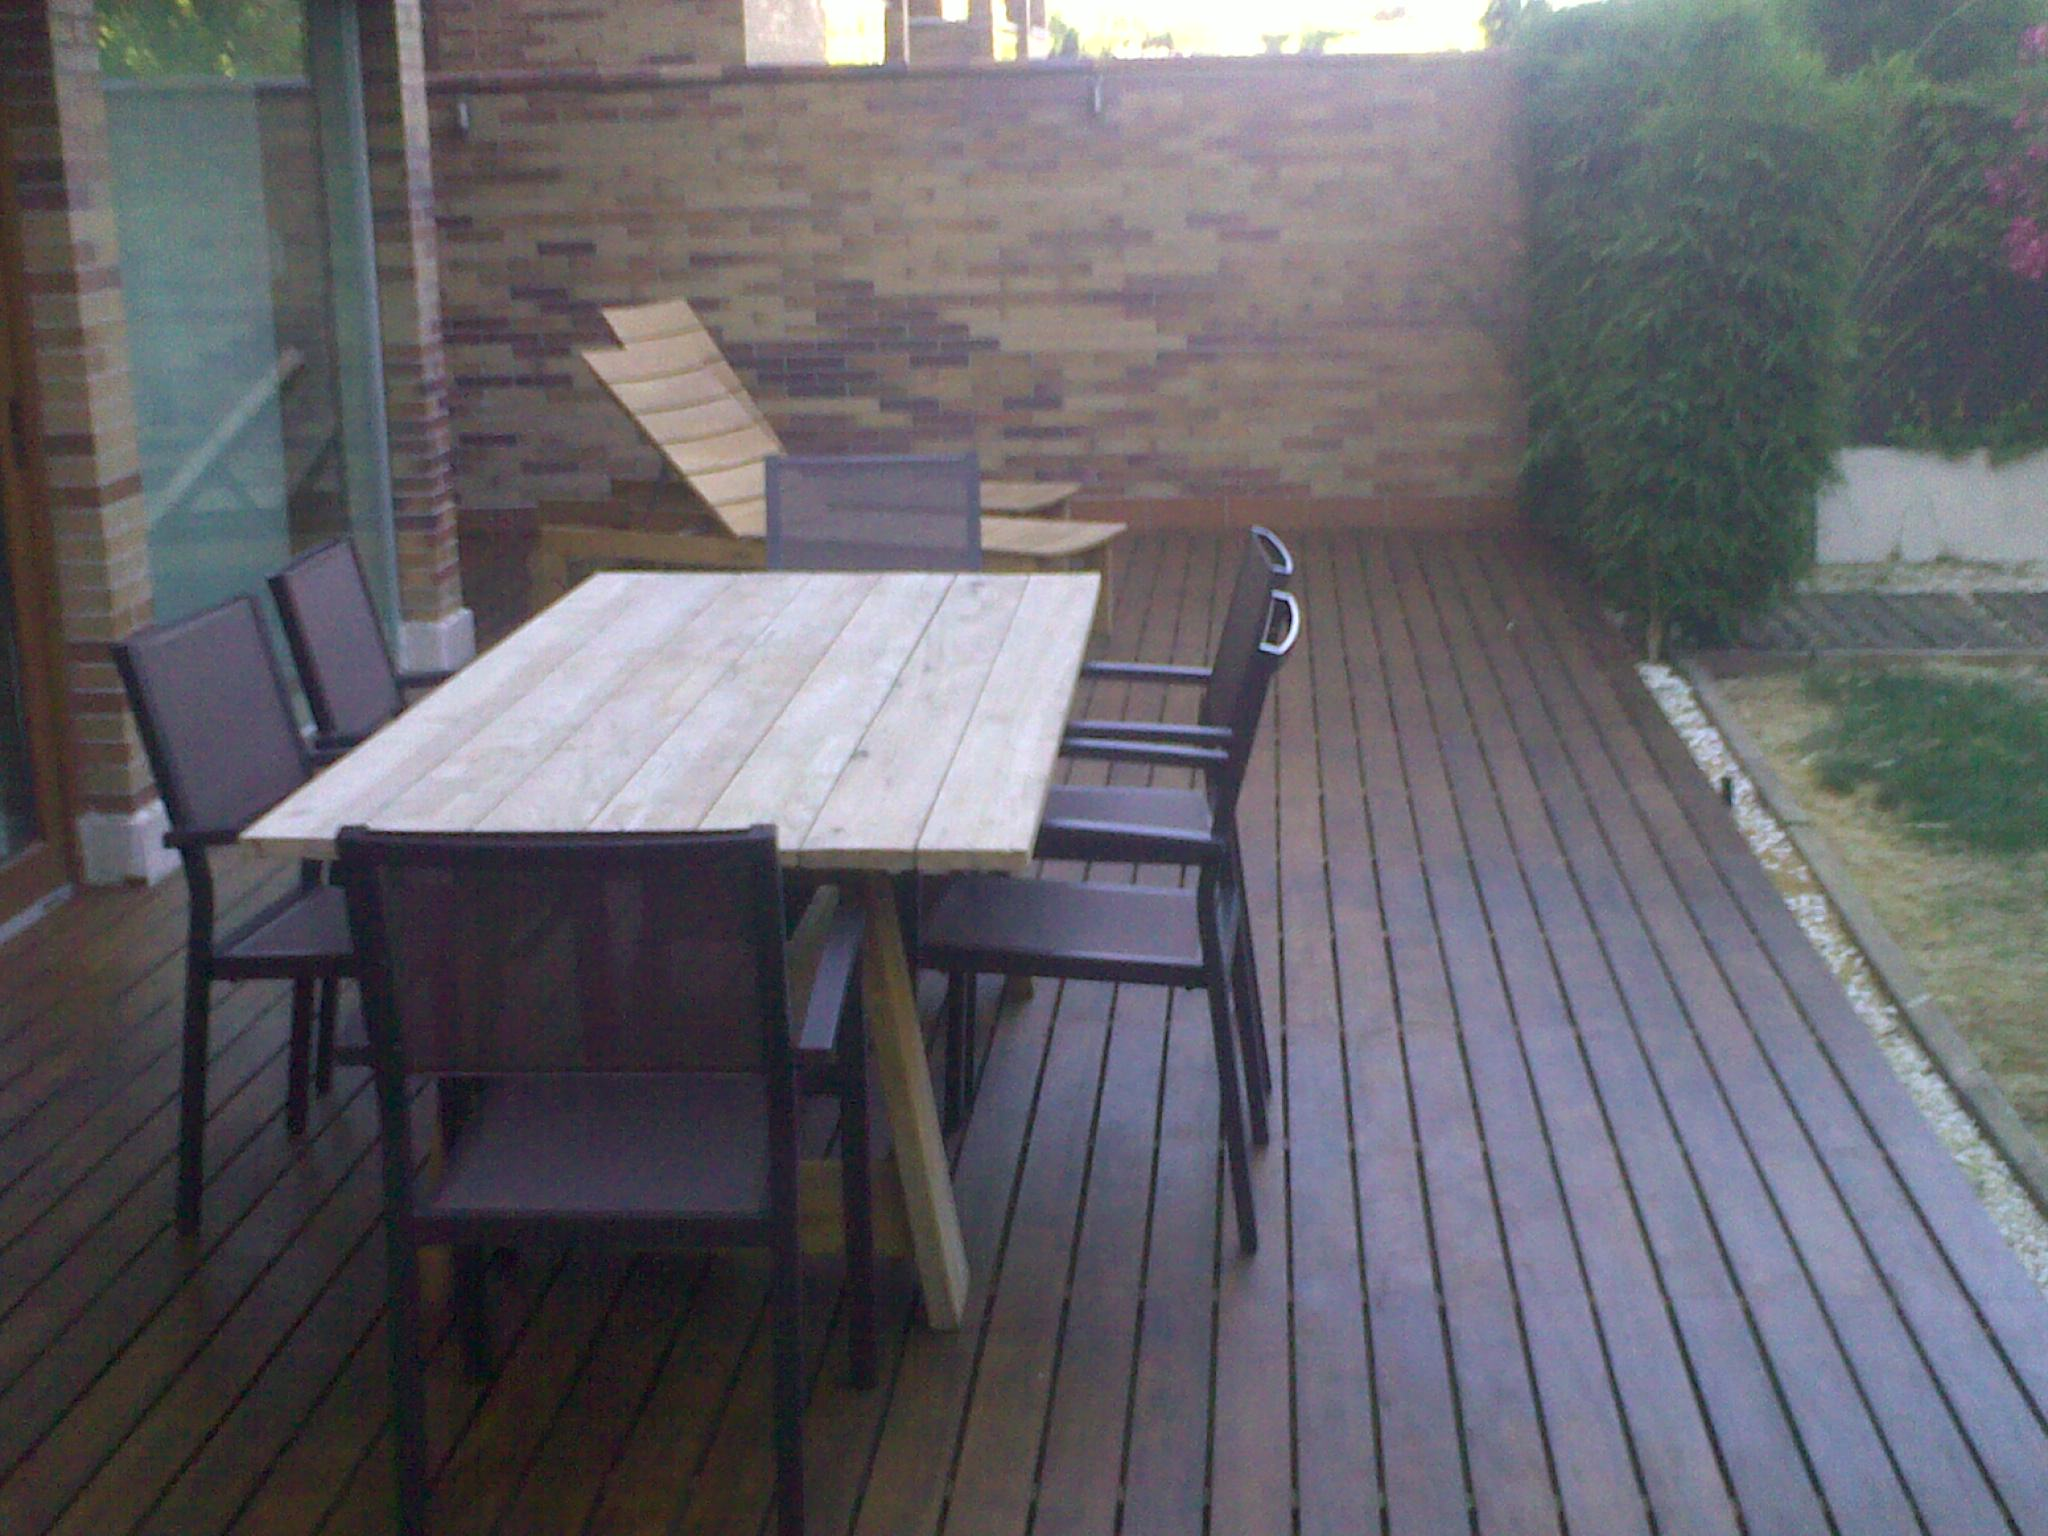 https://topmadera.com/wp-content/uploads/grapa-de-pvc-para-tarima-de-ipe-exterior-en-jardin-en-madrid.jpg